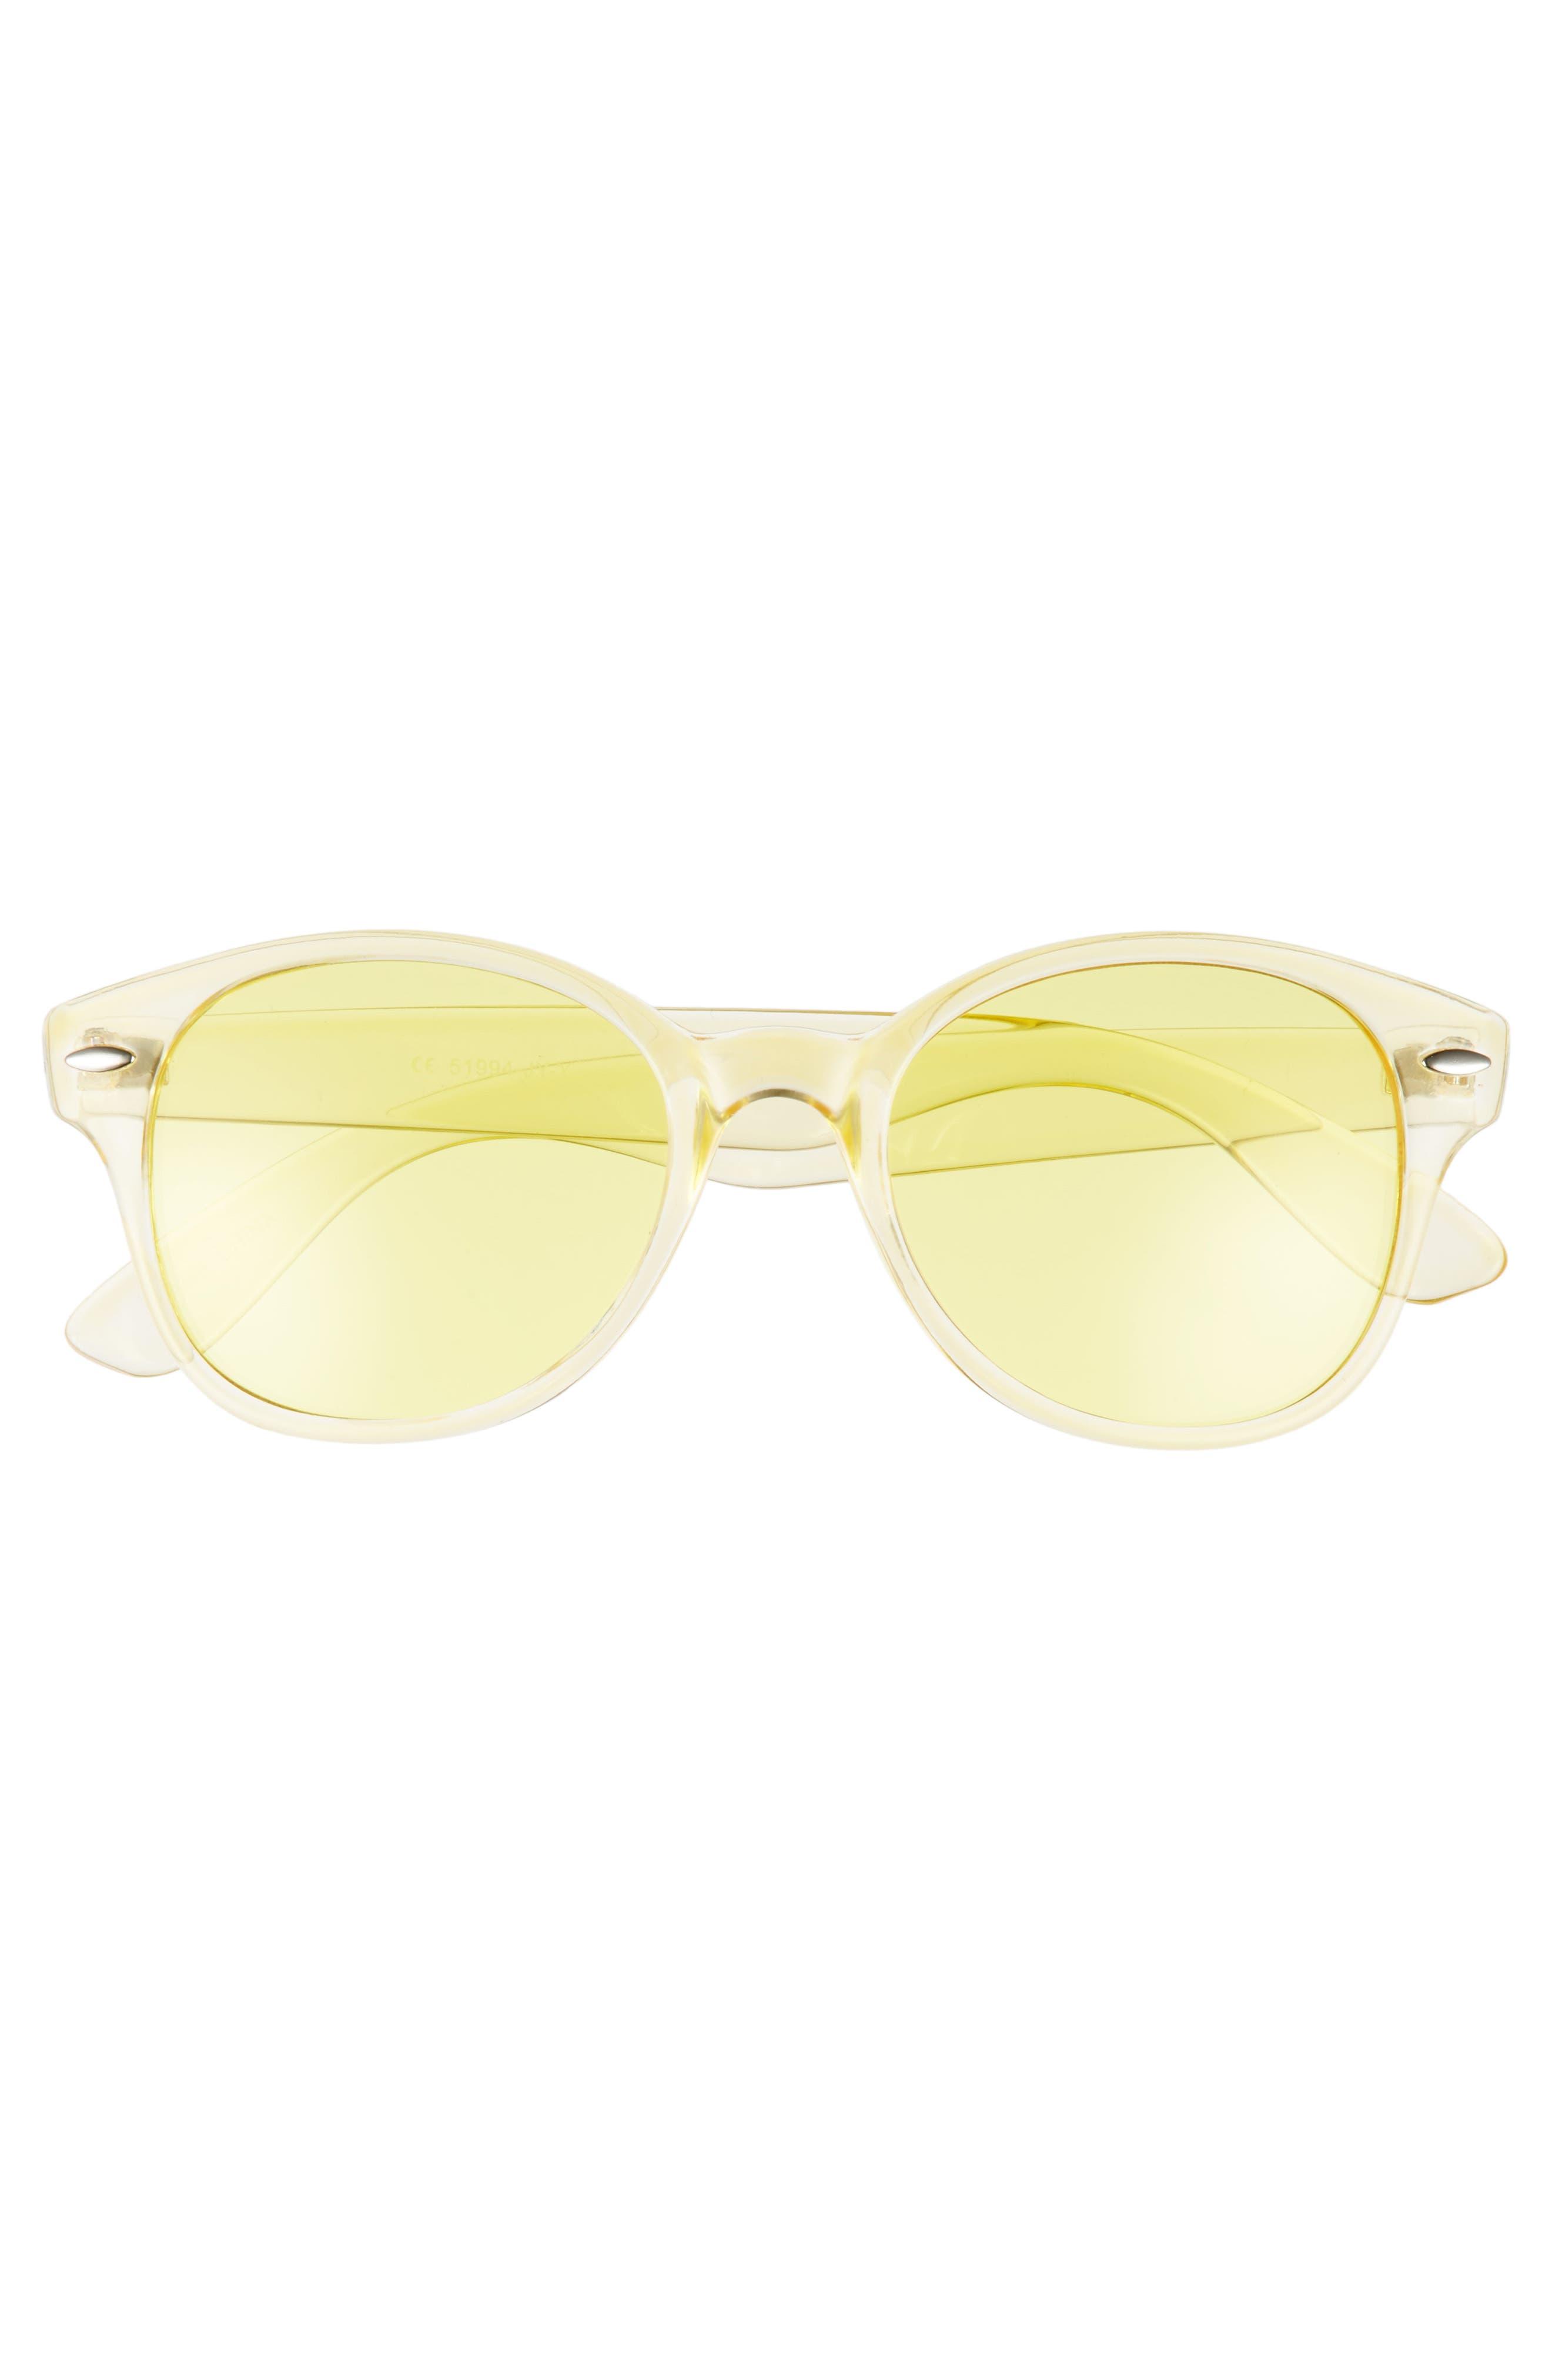 50mm Transparent Round Sunglasses,                             Alternate thumbnail 3, color,